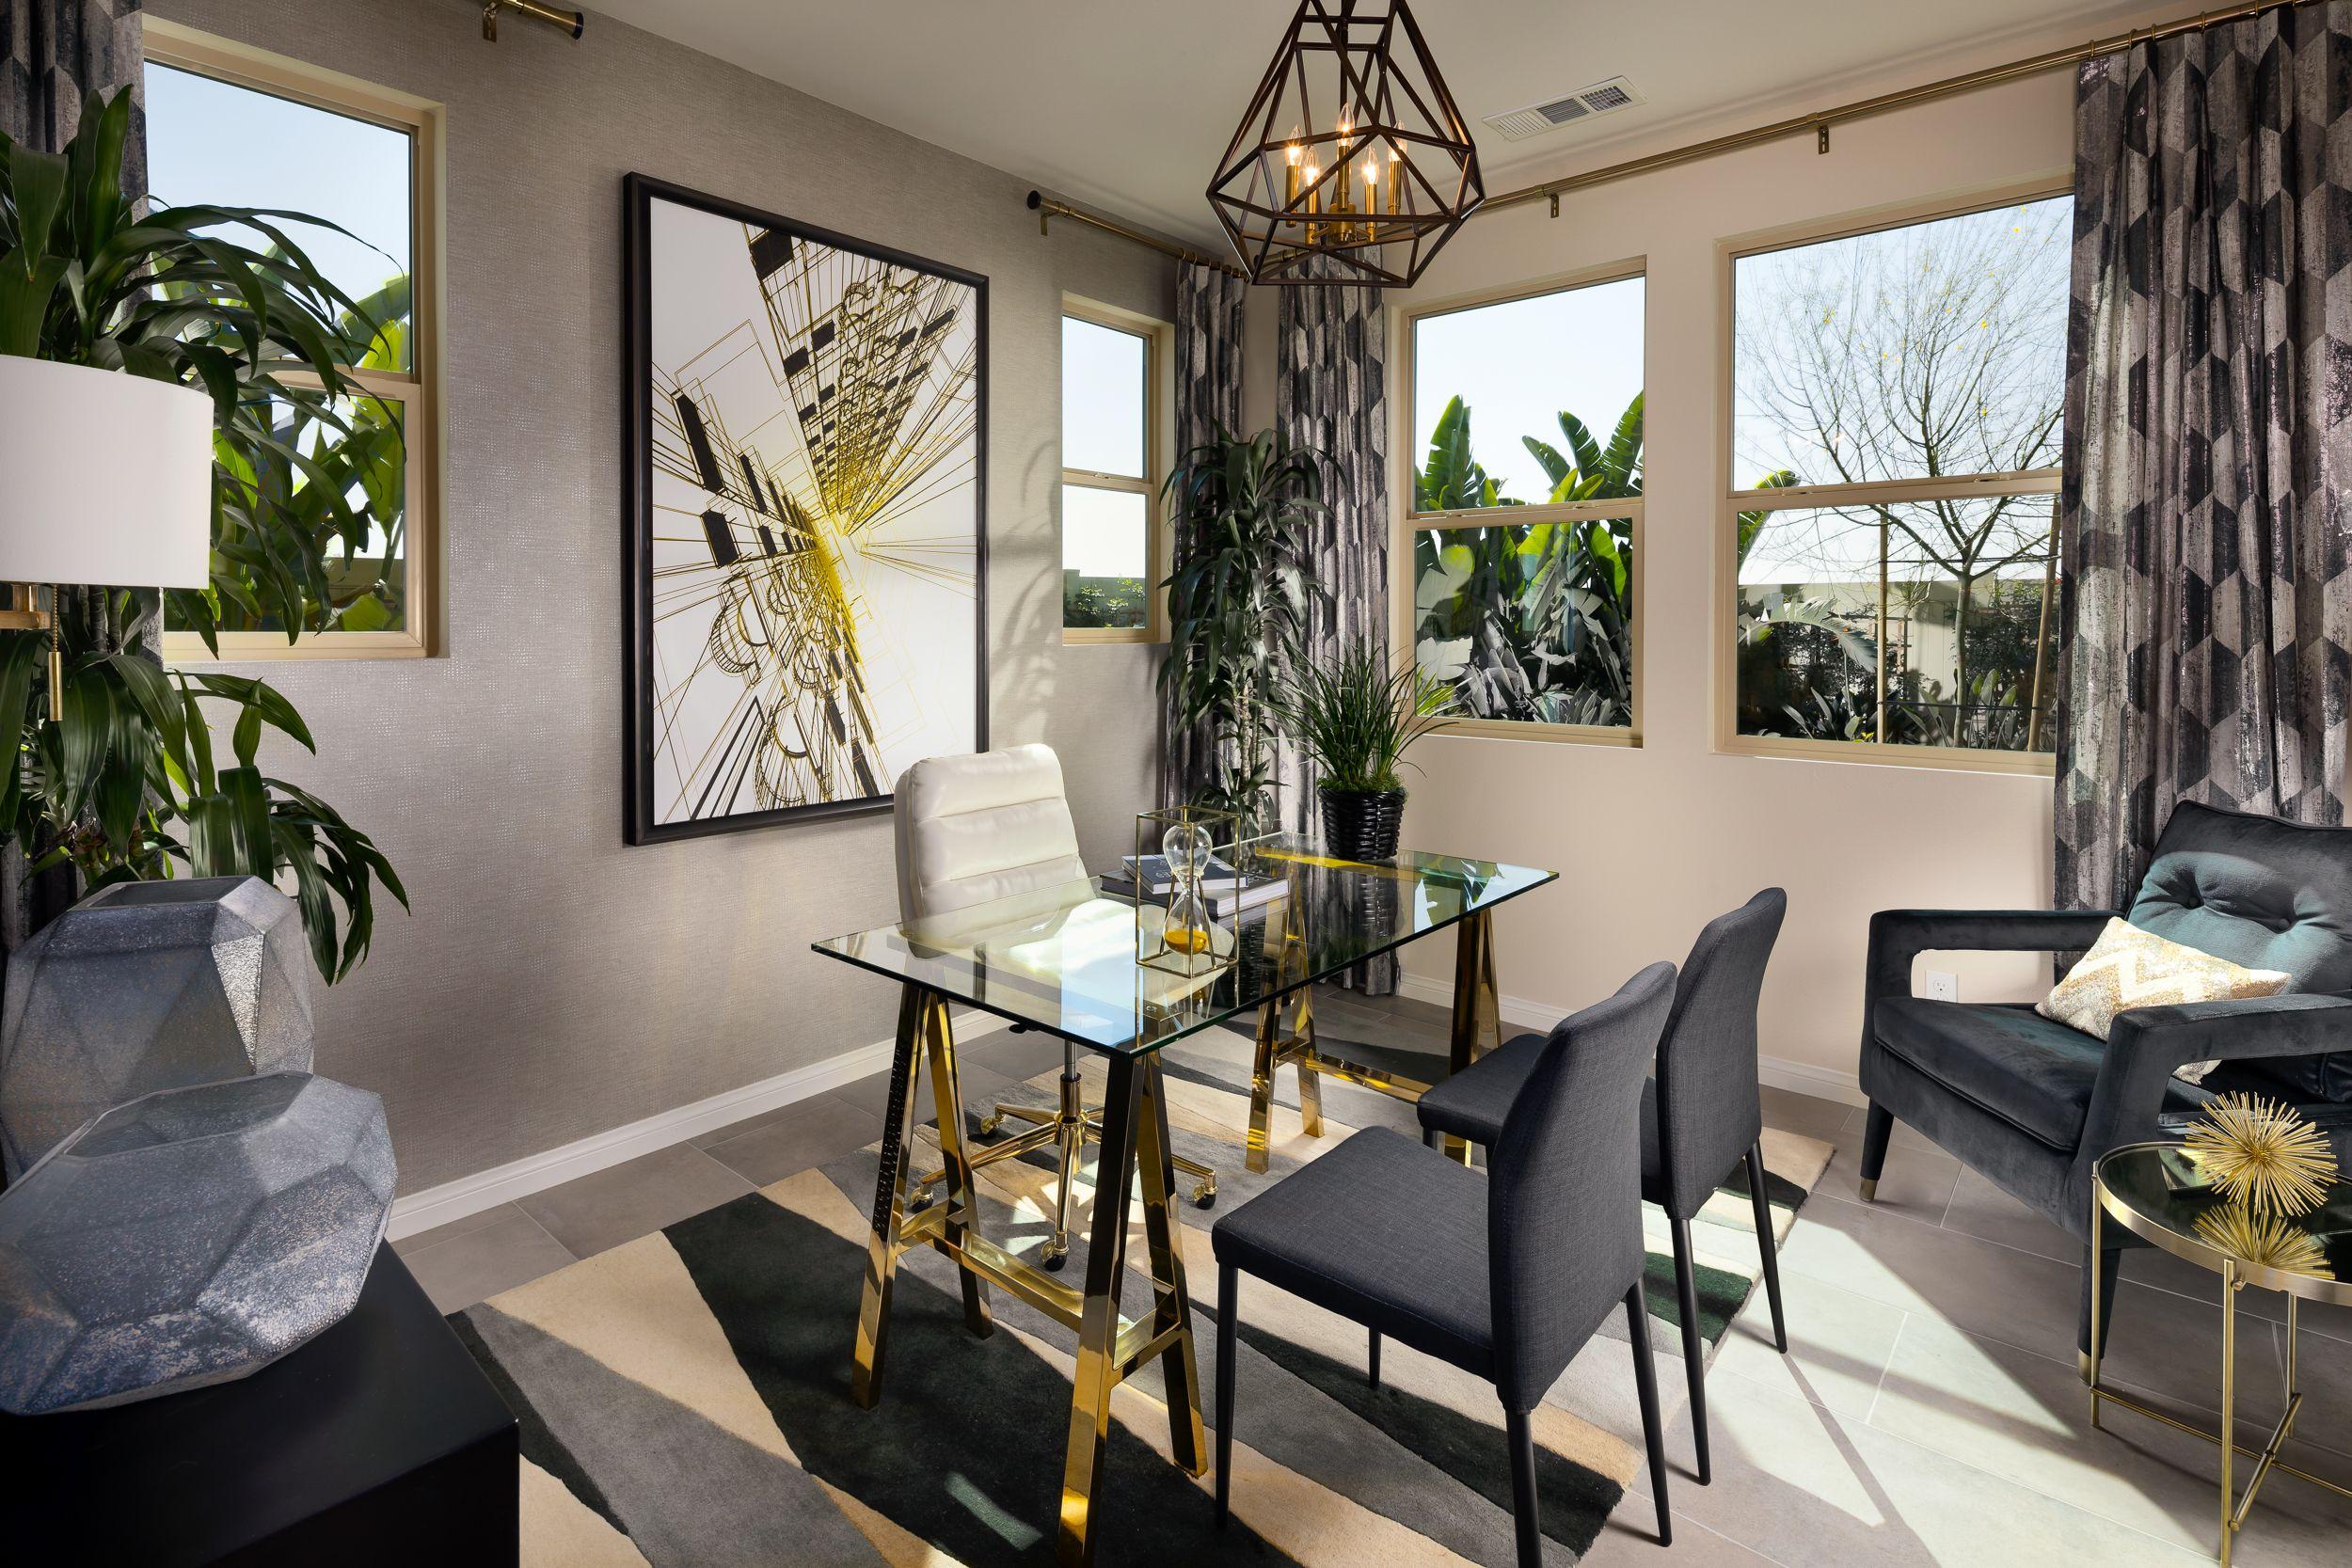 Strata at Escaya New house plans, Best interior design, Home